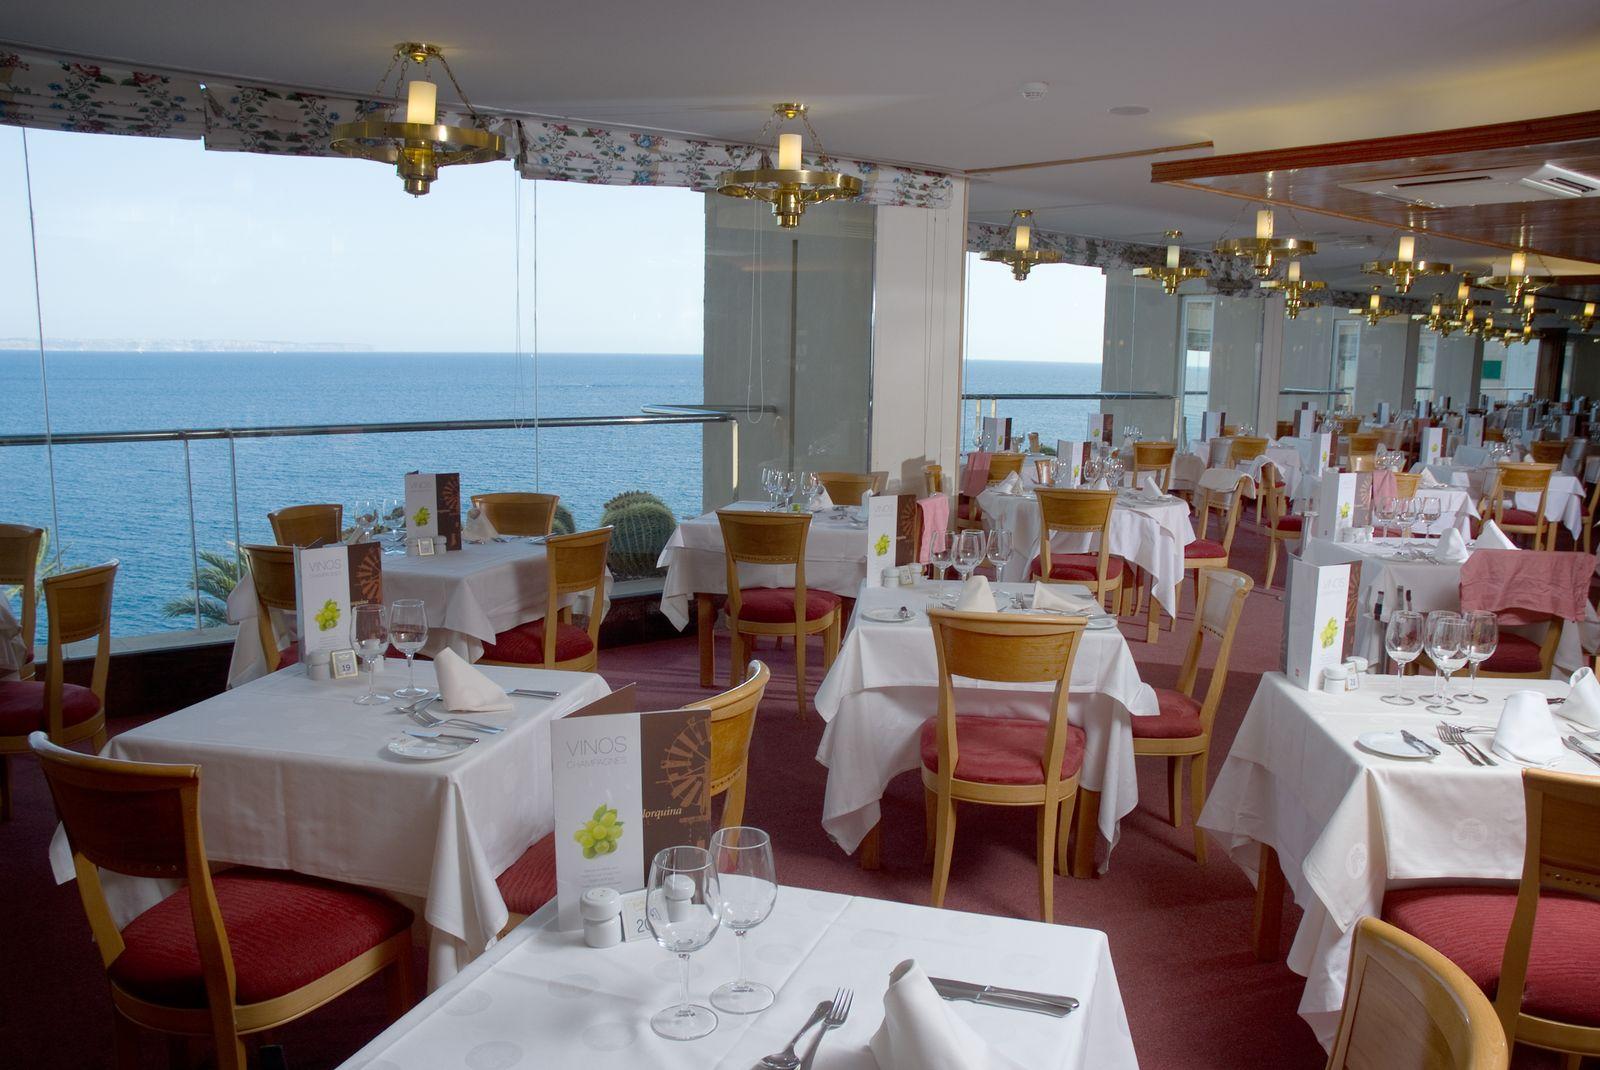 RESTAURANTbonanza-playa-restaurante-bonavista.jpg